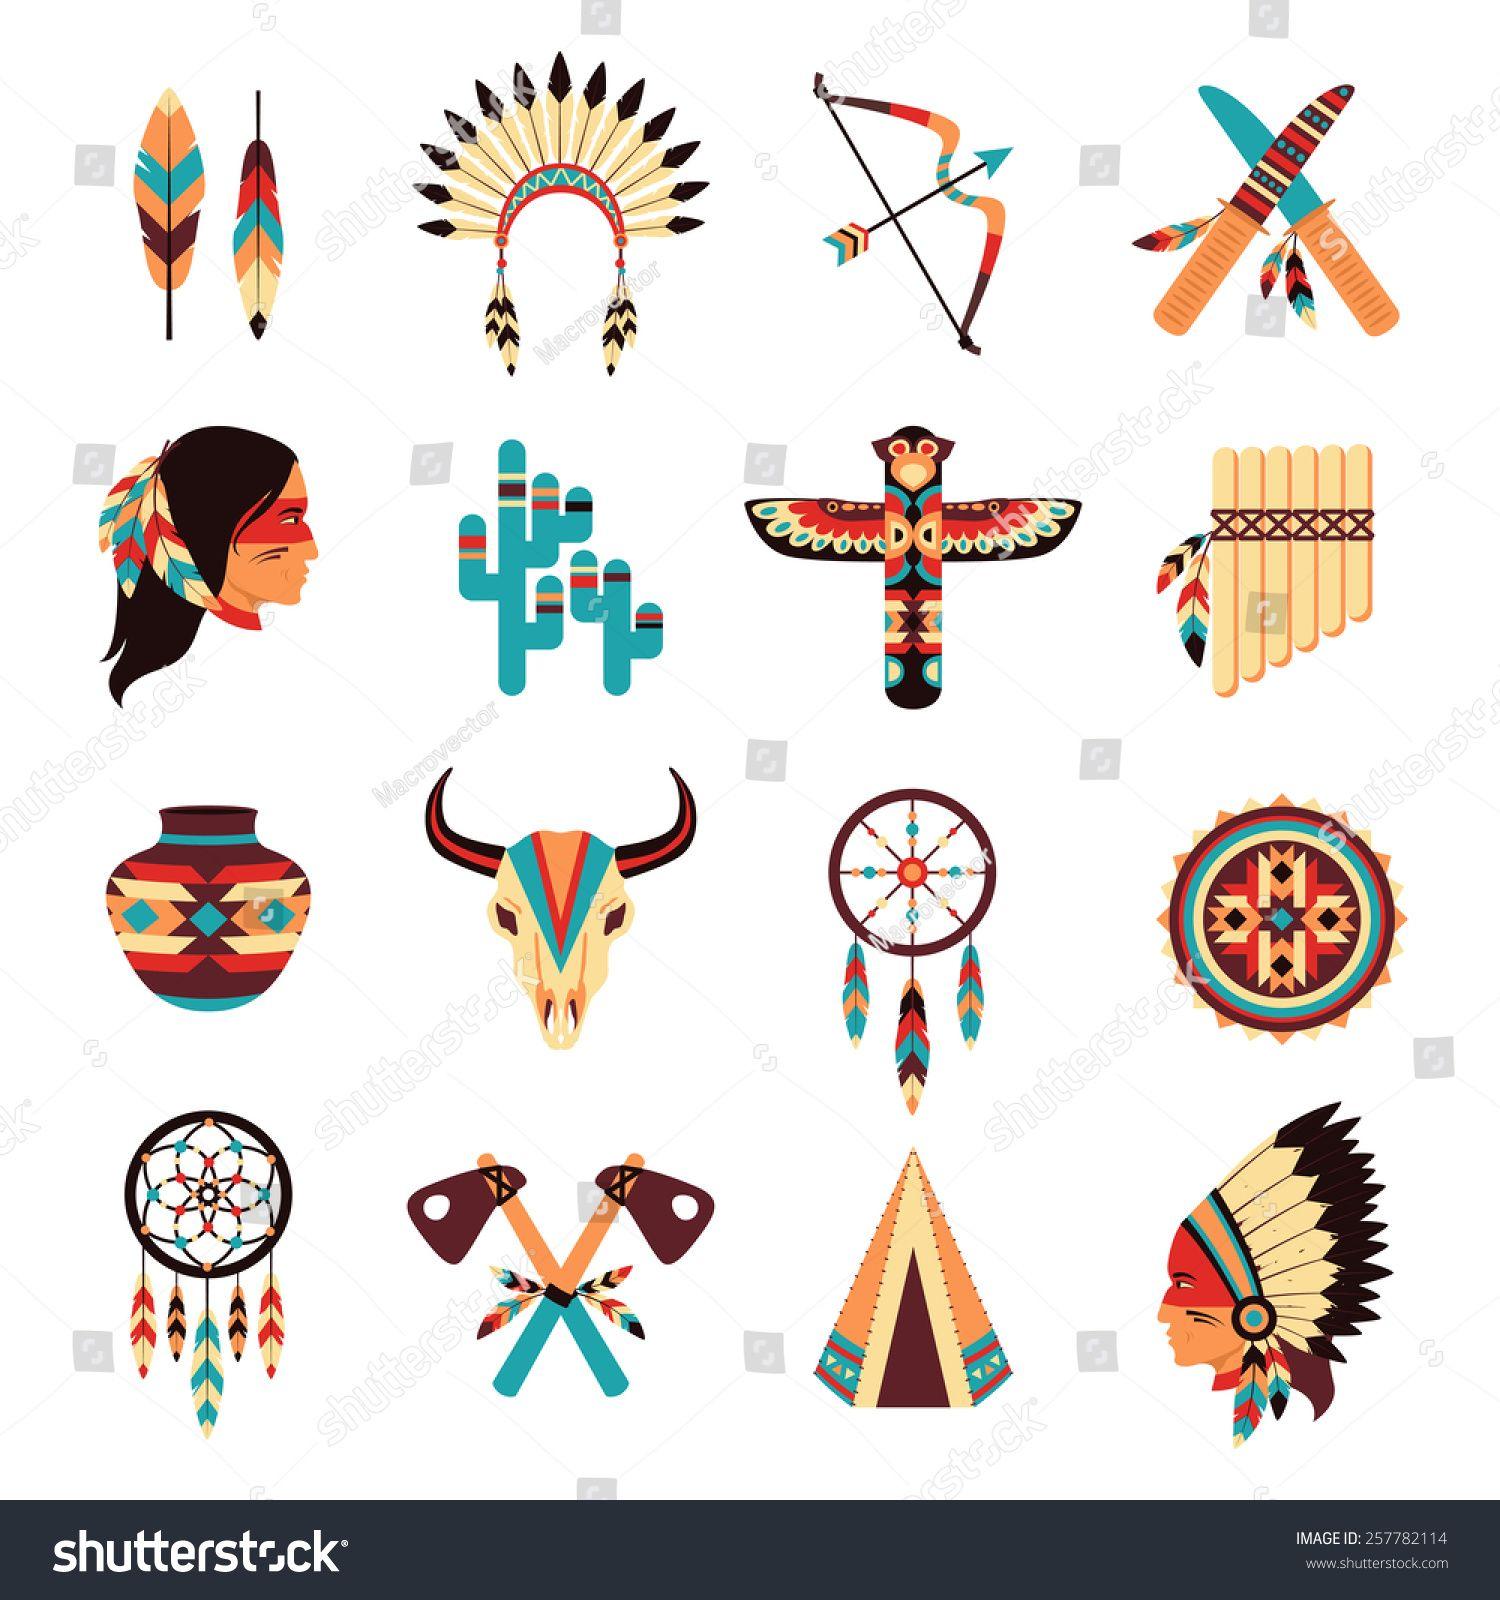 Ethnic american idigenous tribal amulets and symbols icons